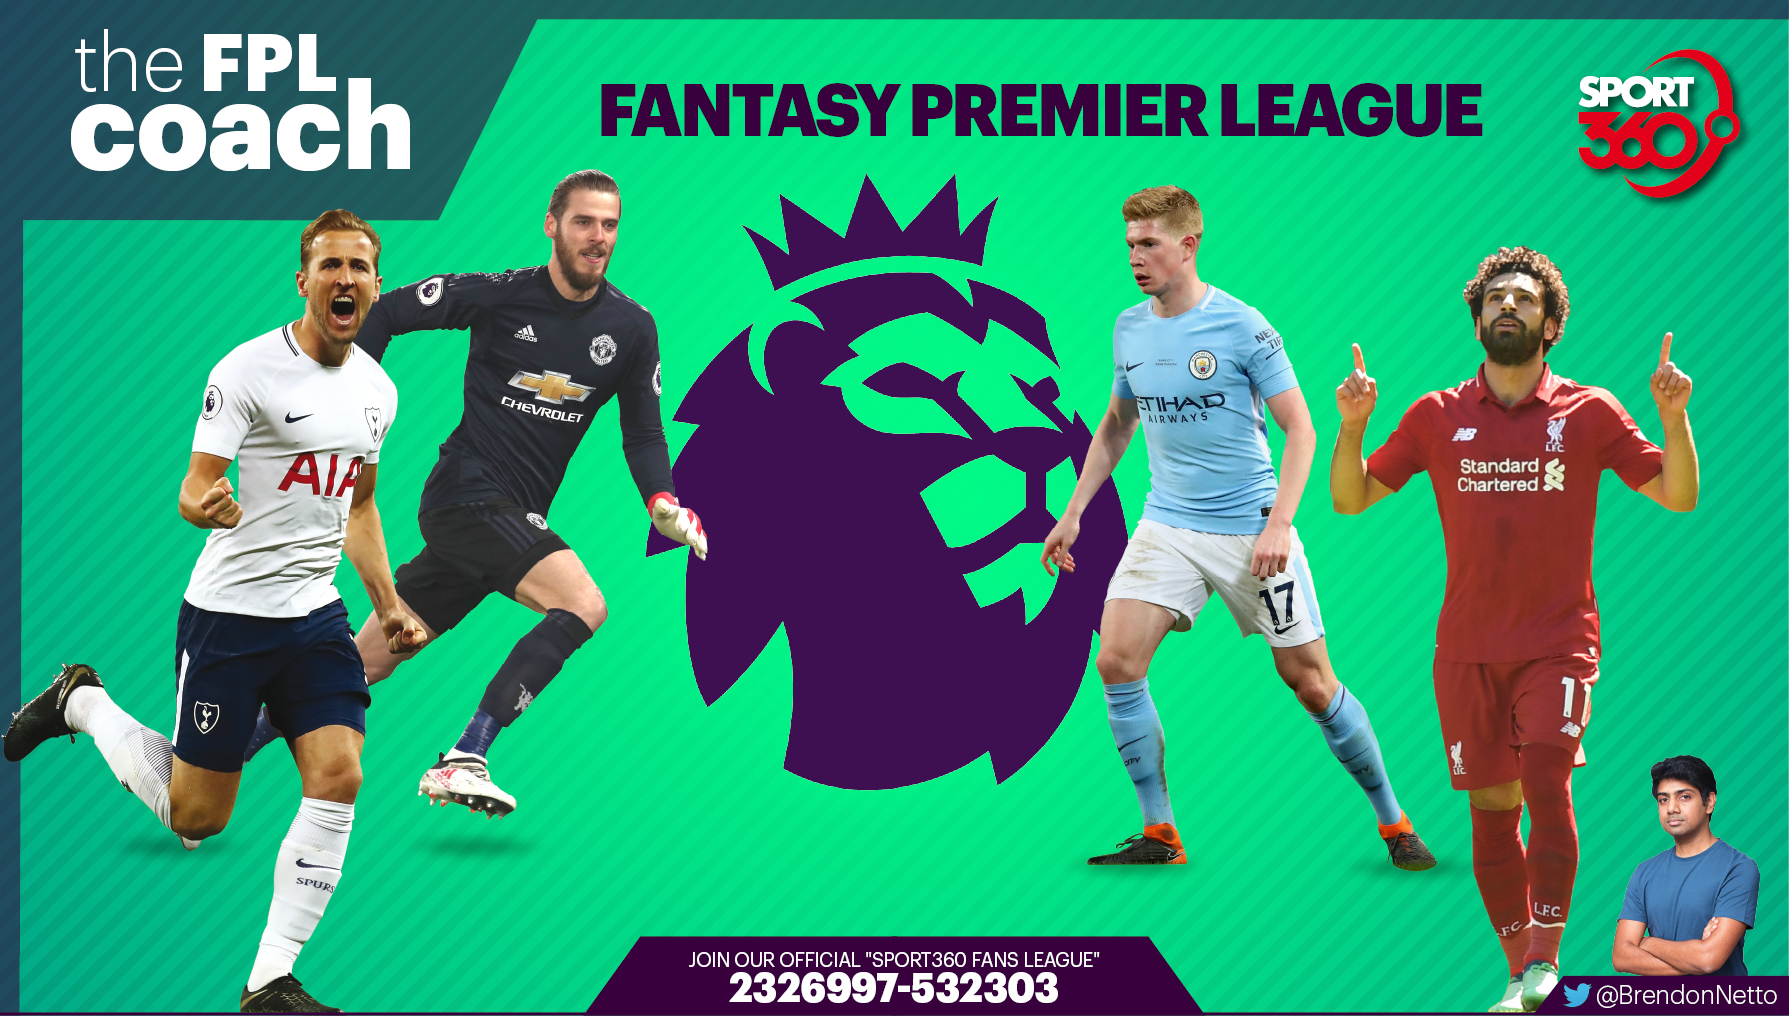 Fantasy Premier League tips: Salah, Hazard safe choices but